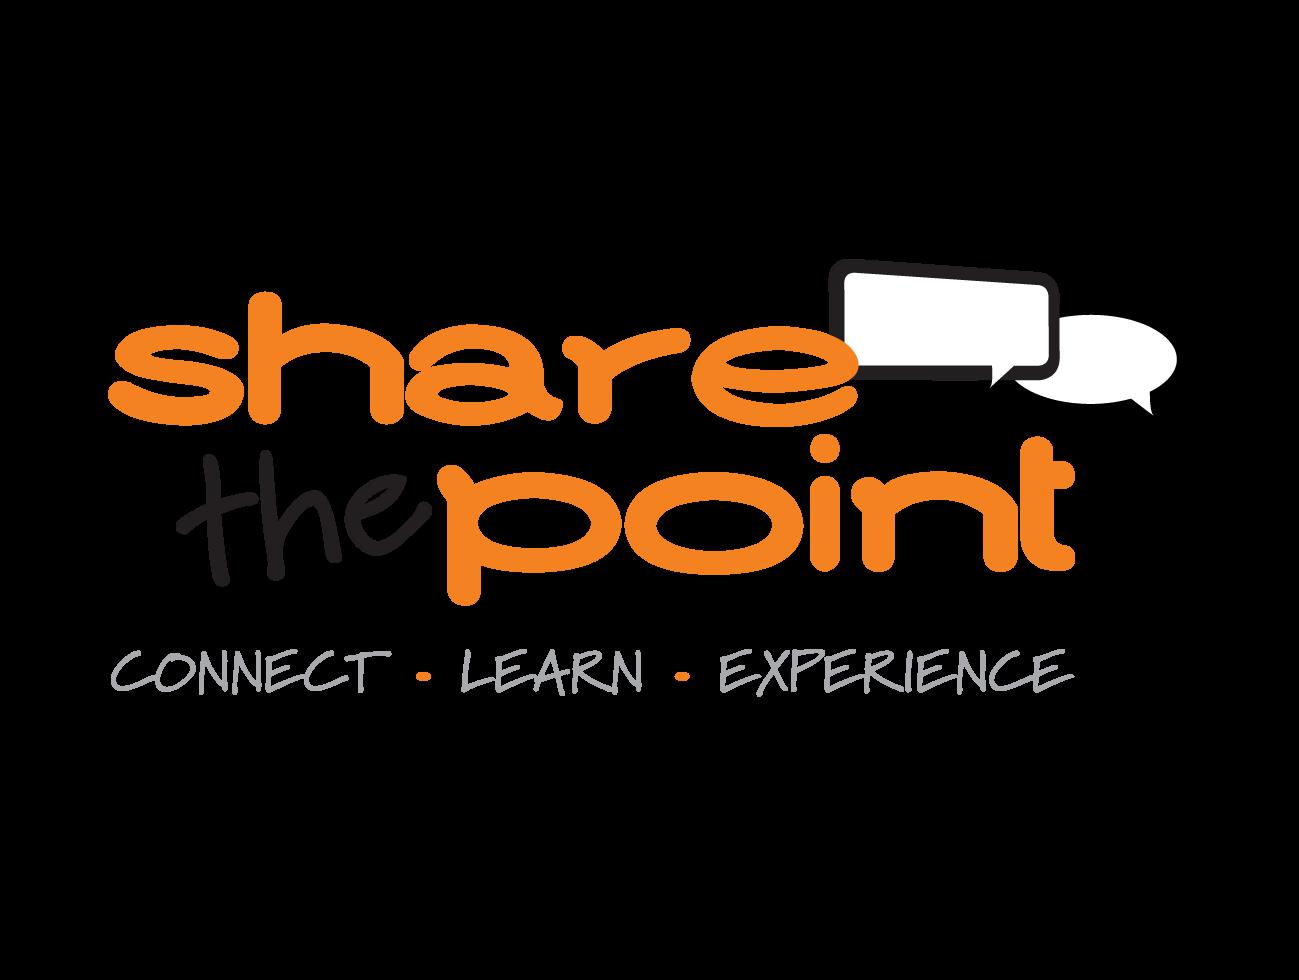 ShareThePoint logo